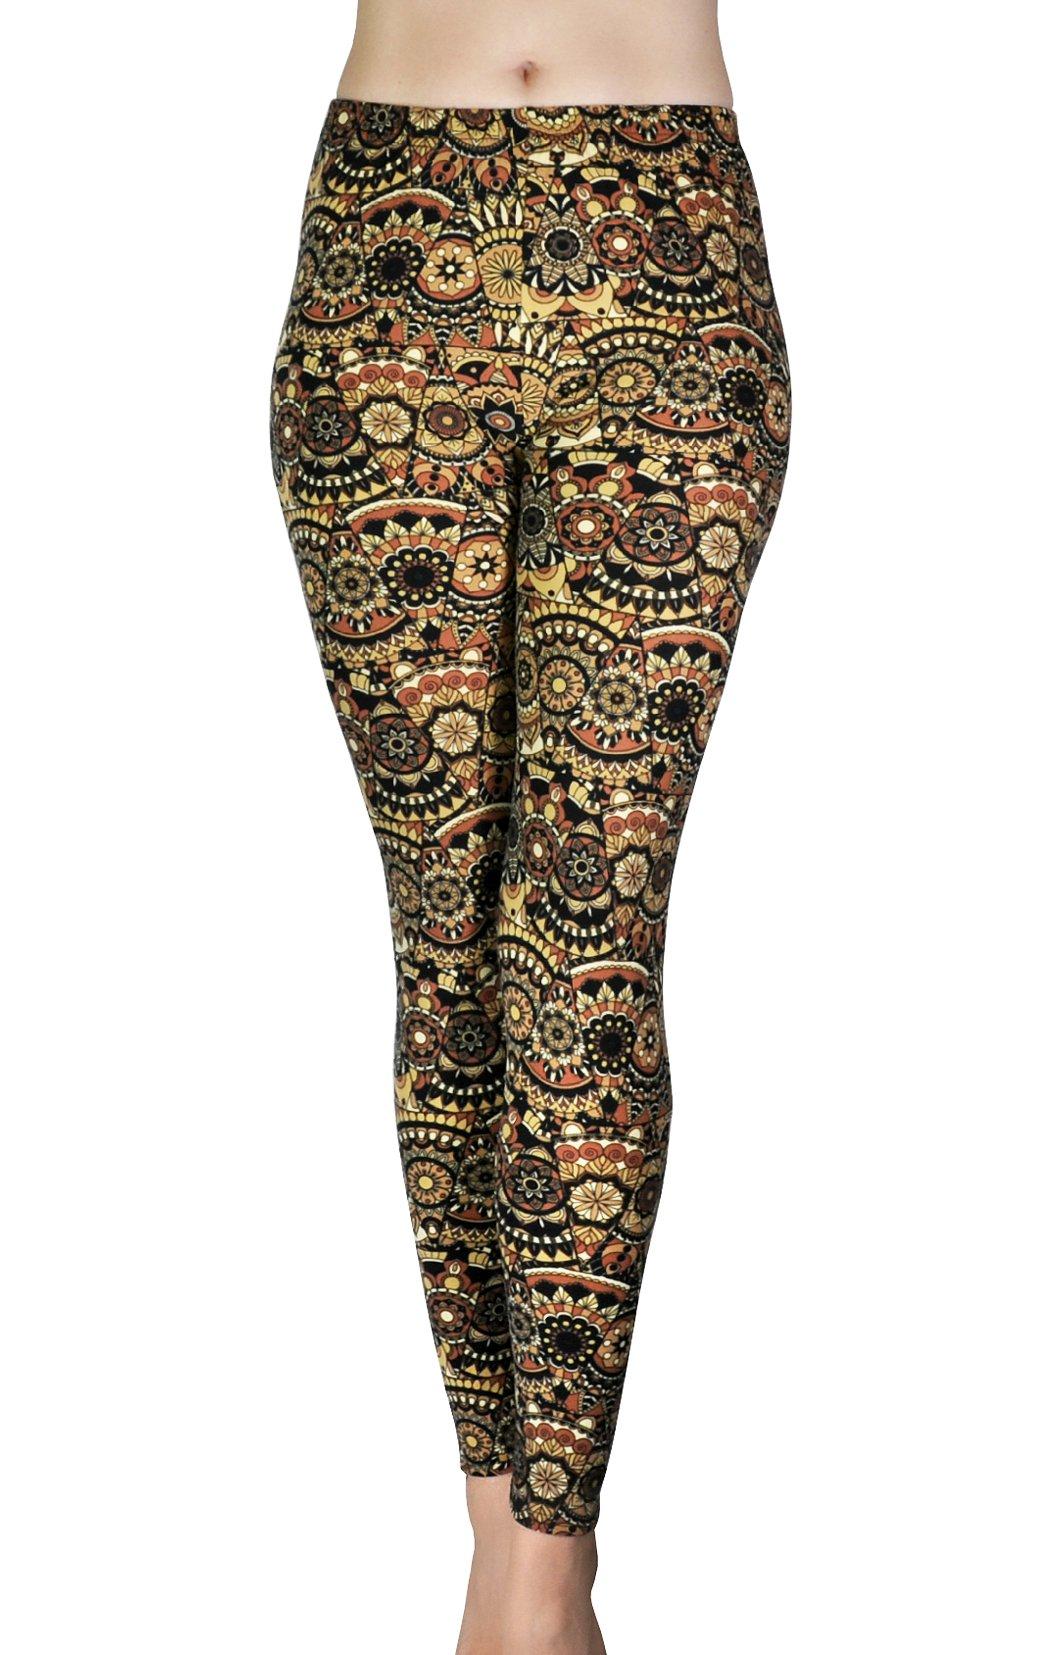 Comfy Yoga - Super Soft Printed Fashion Leggings - Slim Elastic Waistband - Colorful Fun Prints (One Size, Cocoa)